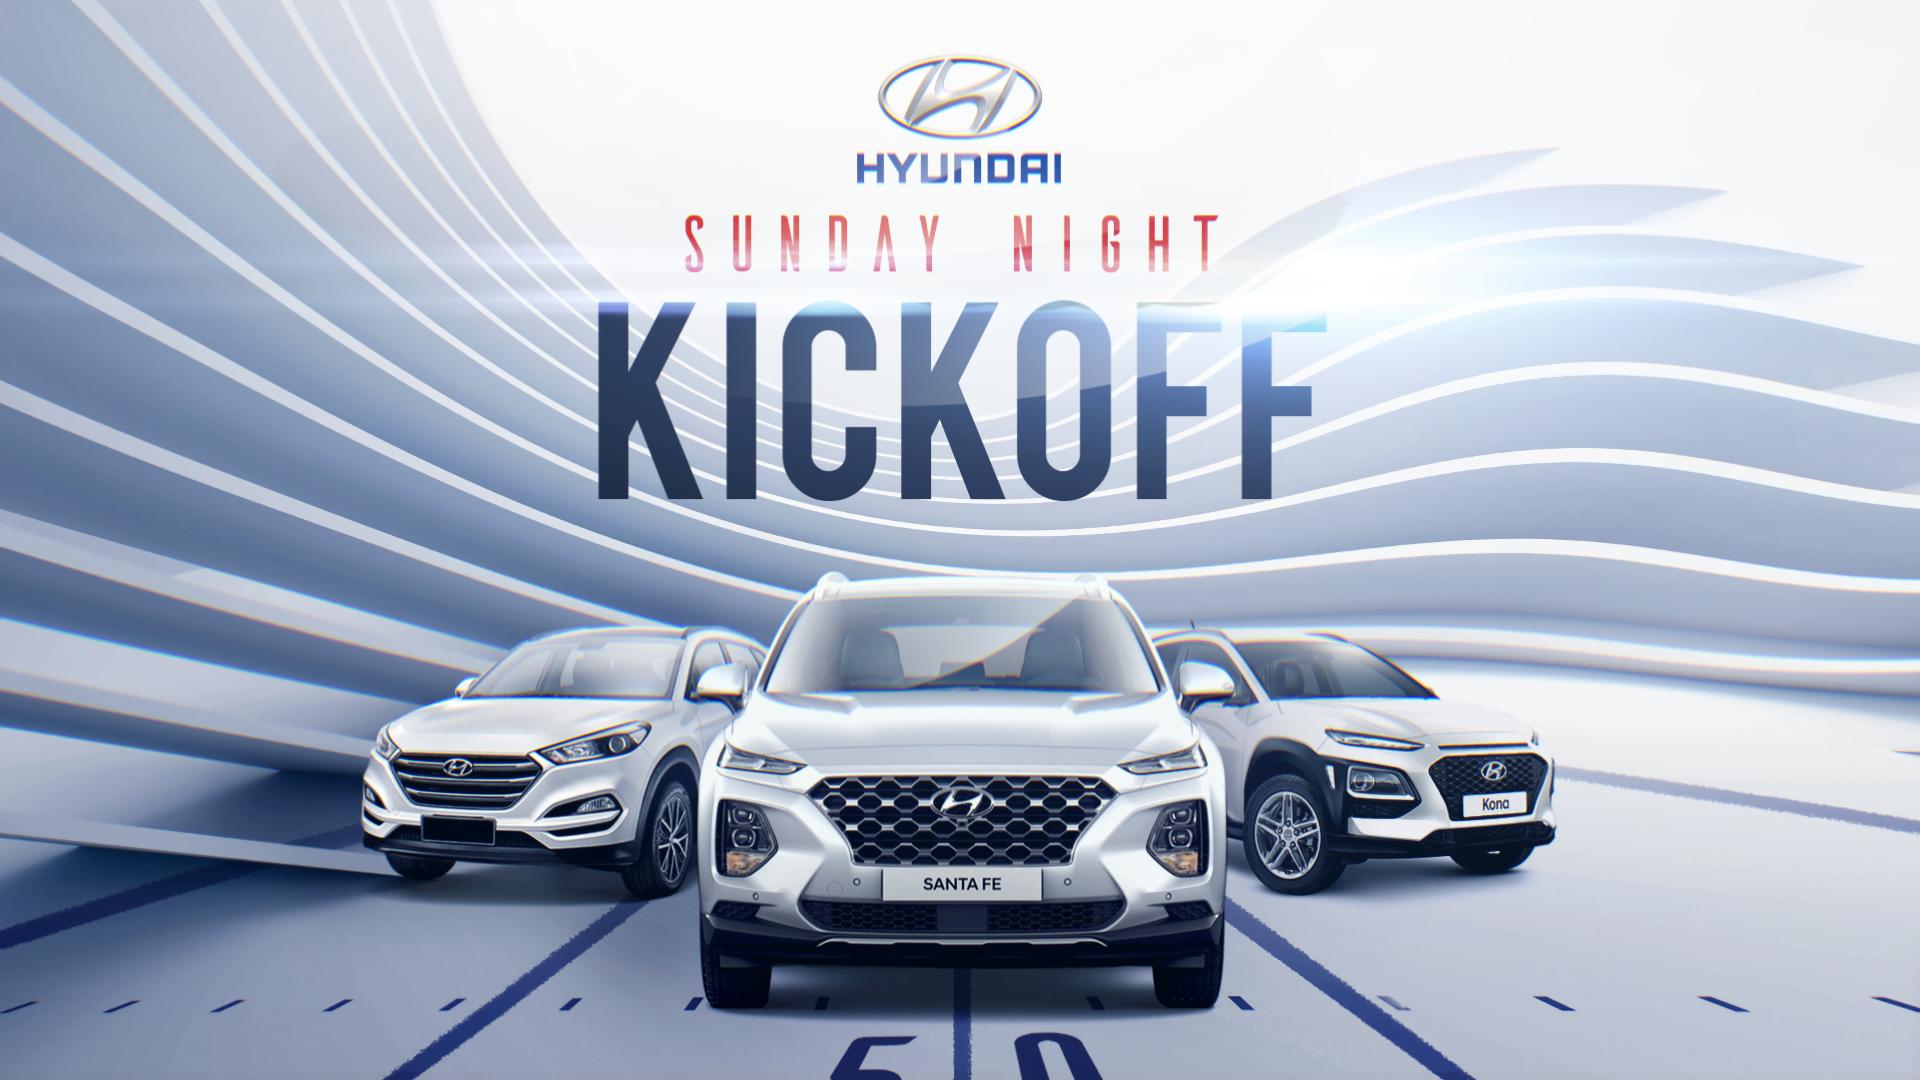 Hyundai_CB_001.png